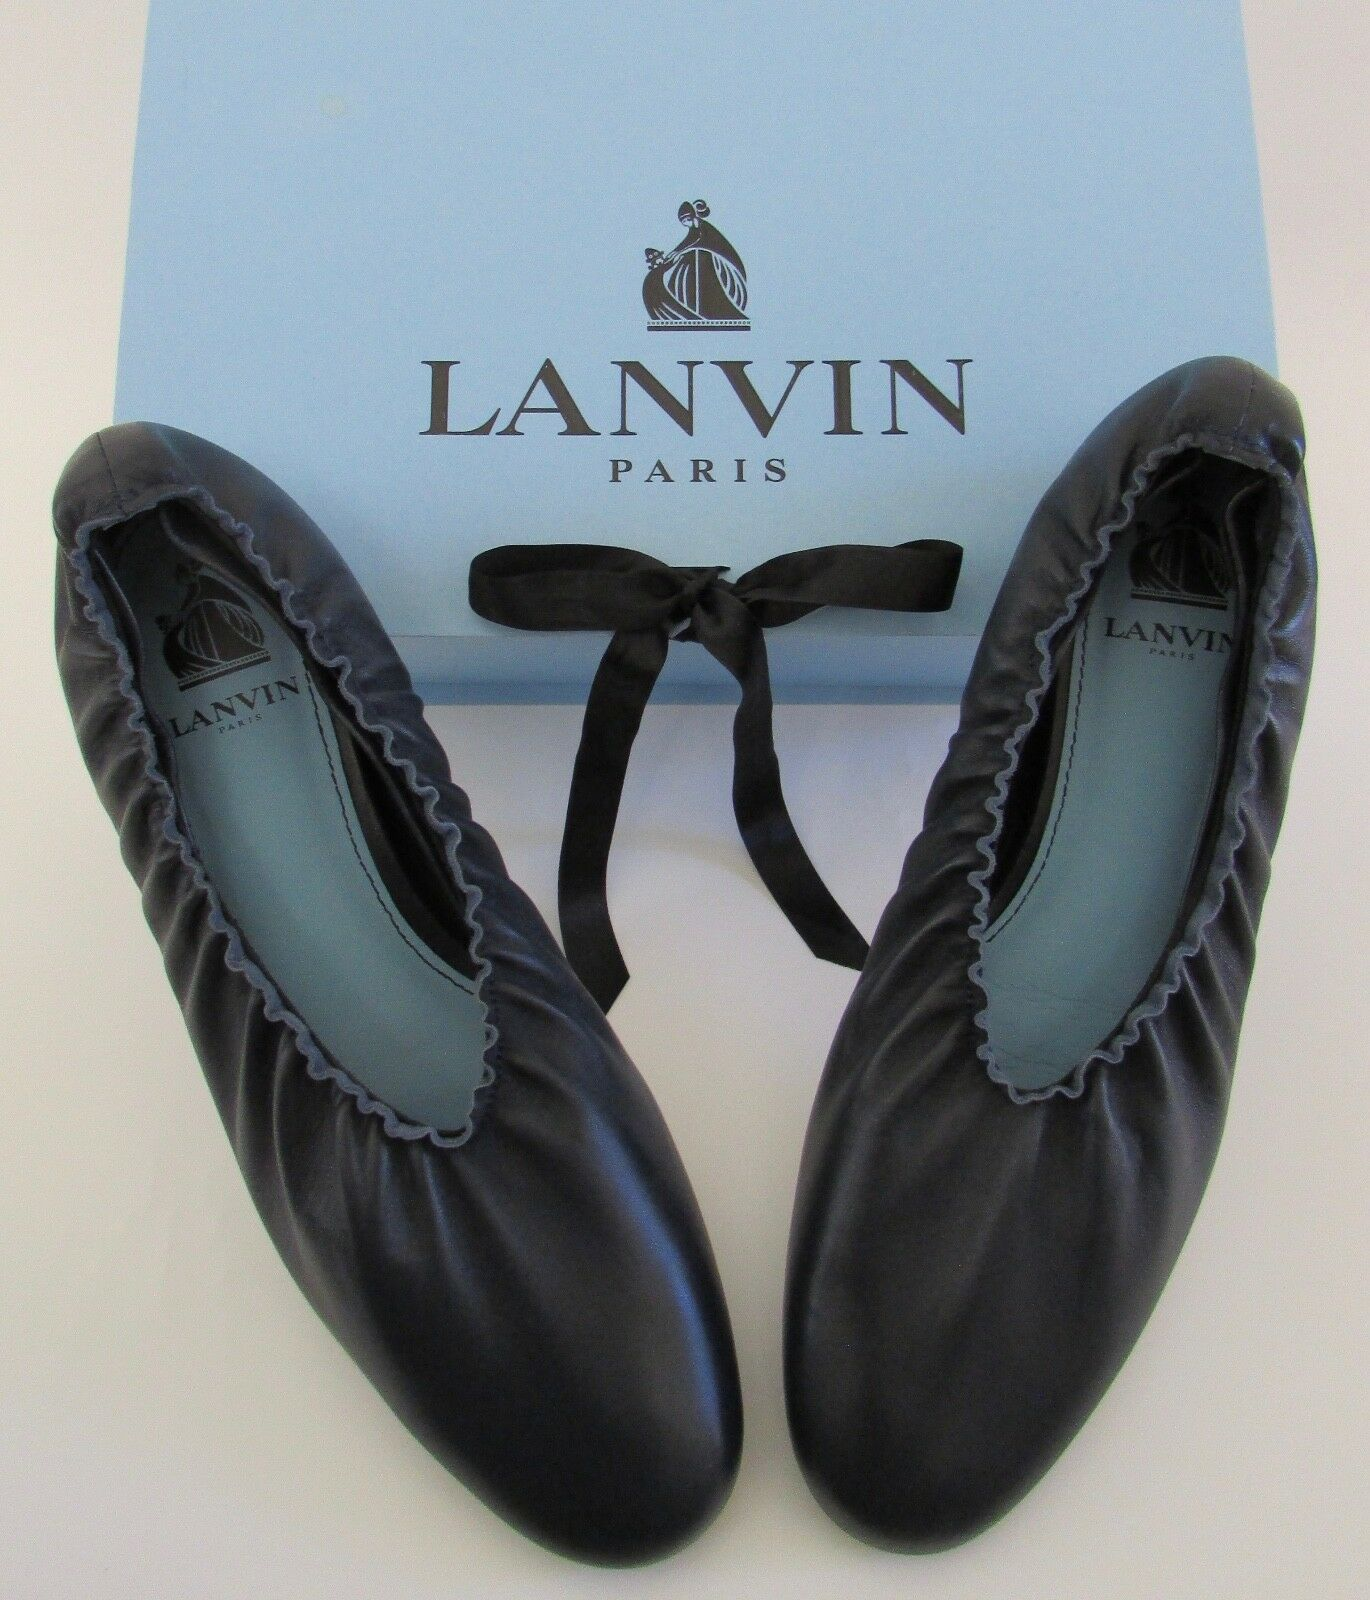 NEW LANVIN Paris Paris LANVIN Midnight blu Pleated Ballerina Flats